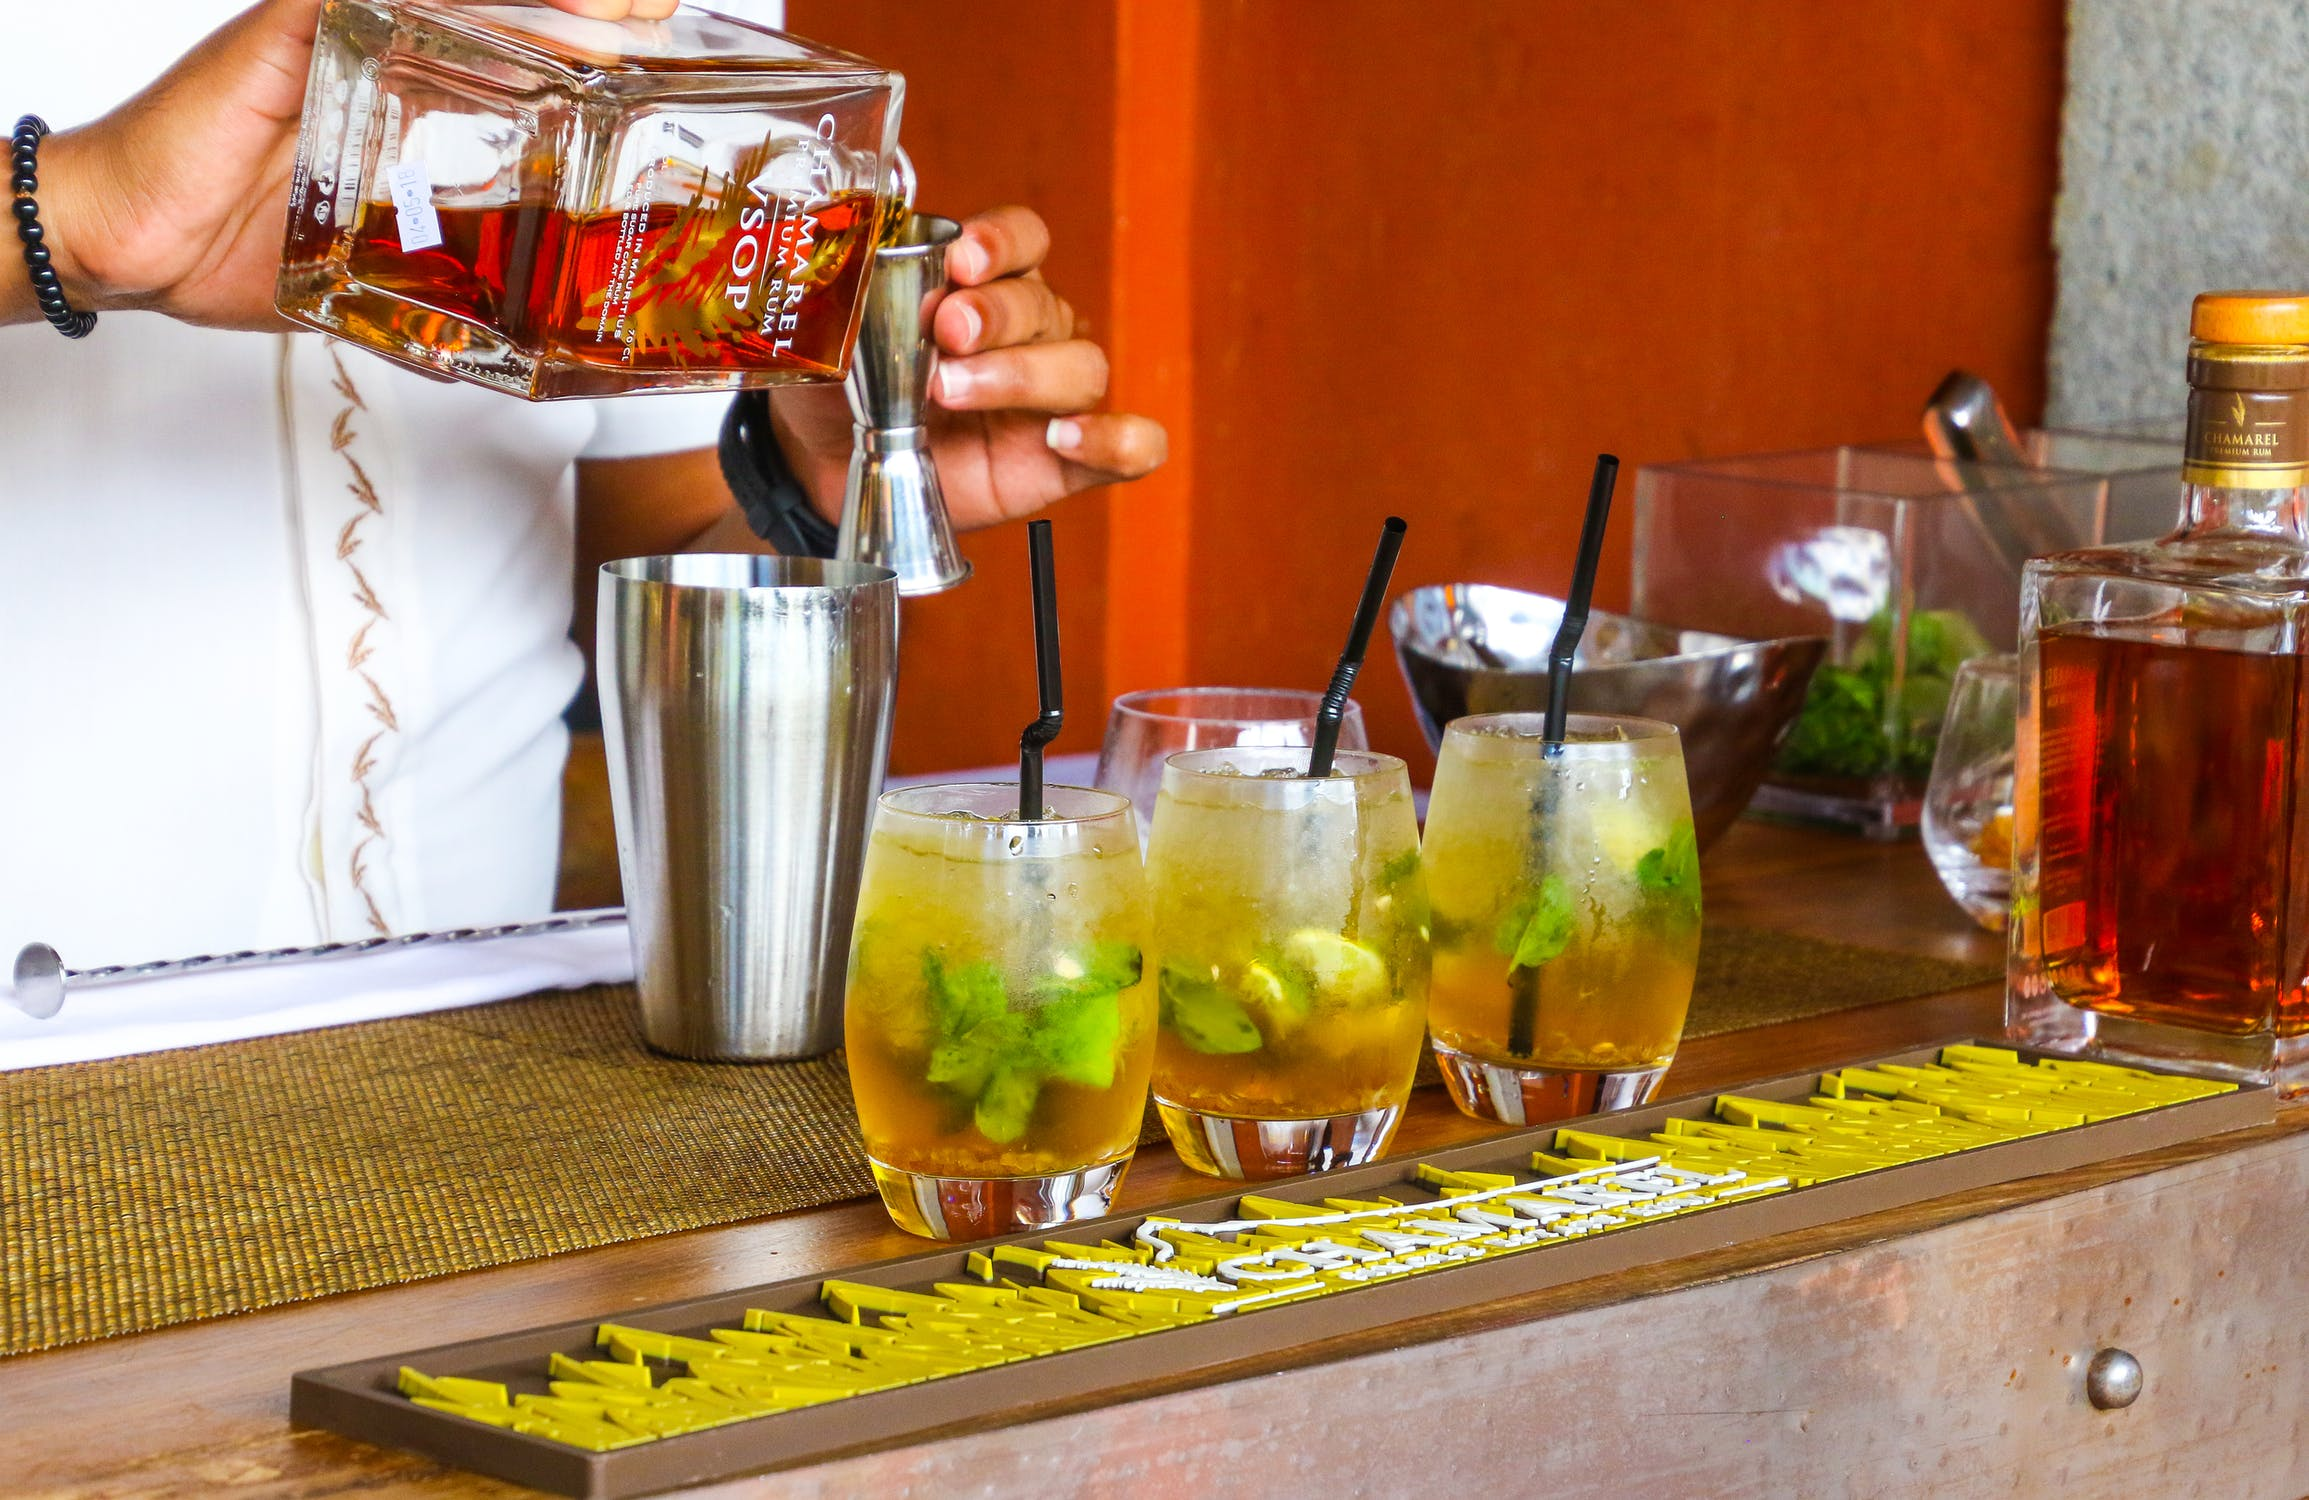 10 Great Bars to Visit in Frankfurt